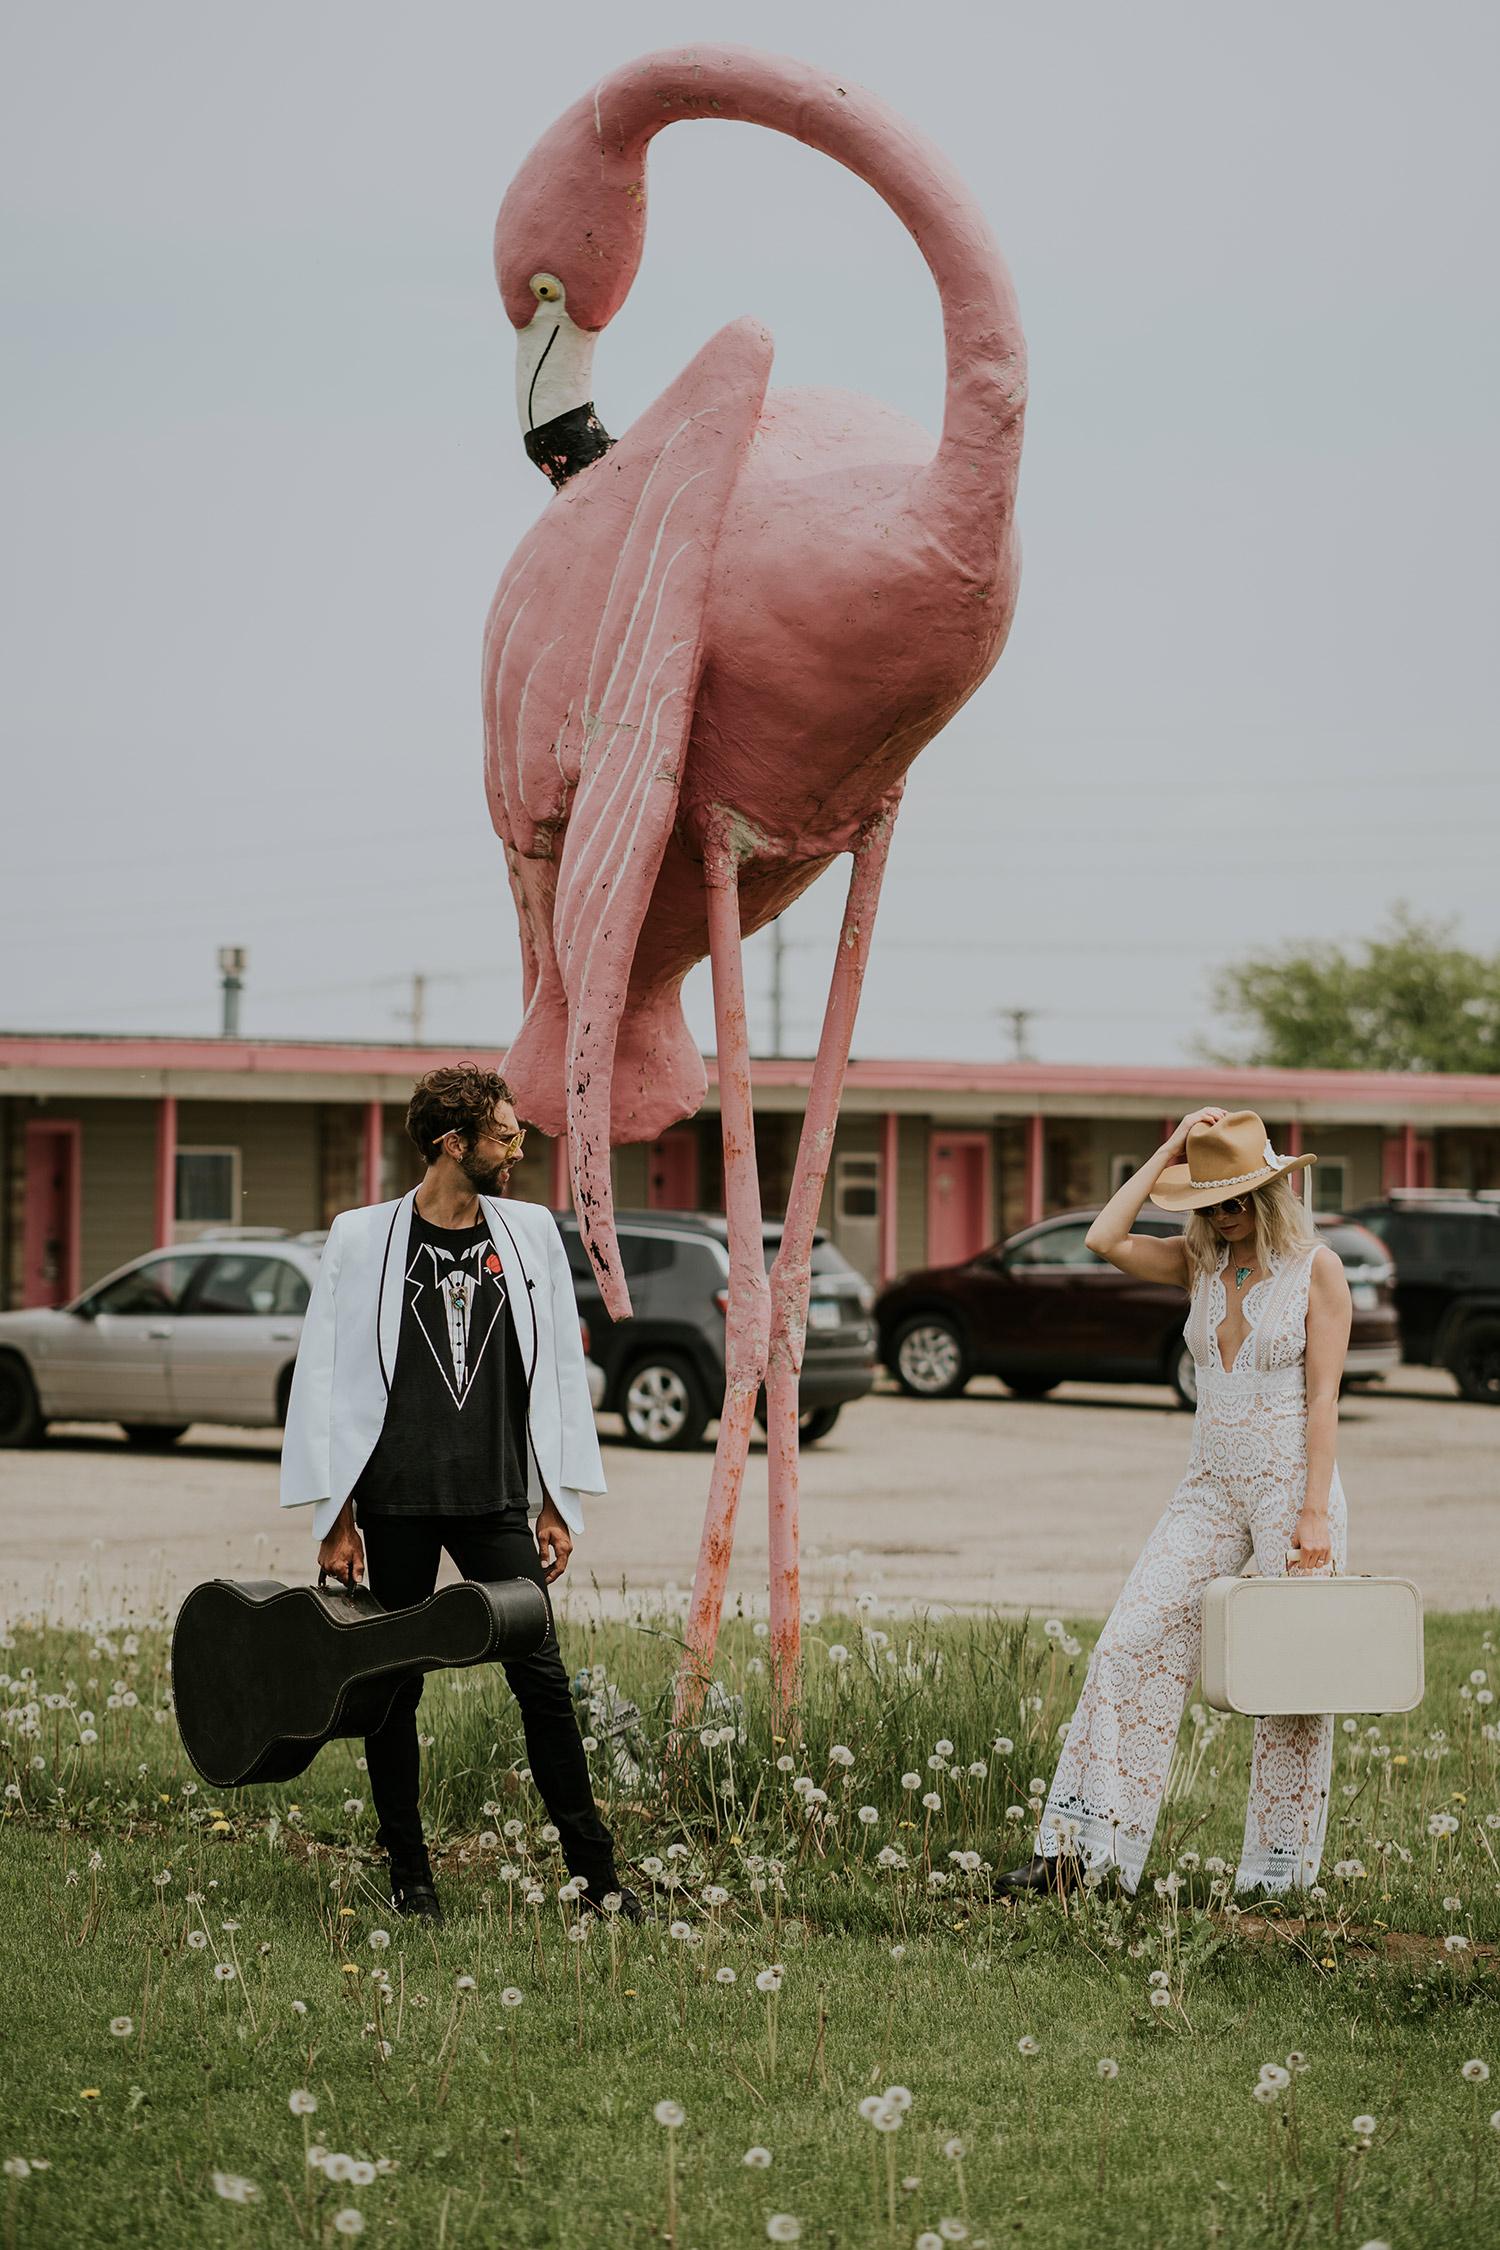 bride-groom-standing-by-flamingo-at-motel-iowa-road-trip-romance-wedding-raelyn-ramey-photography-134.jpg